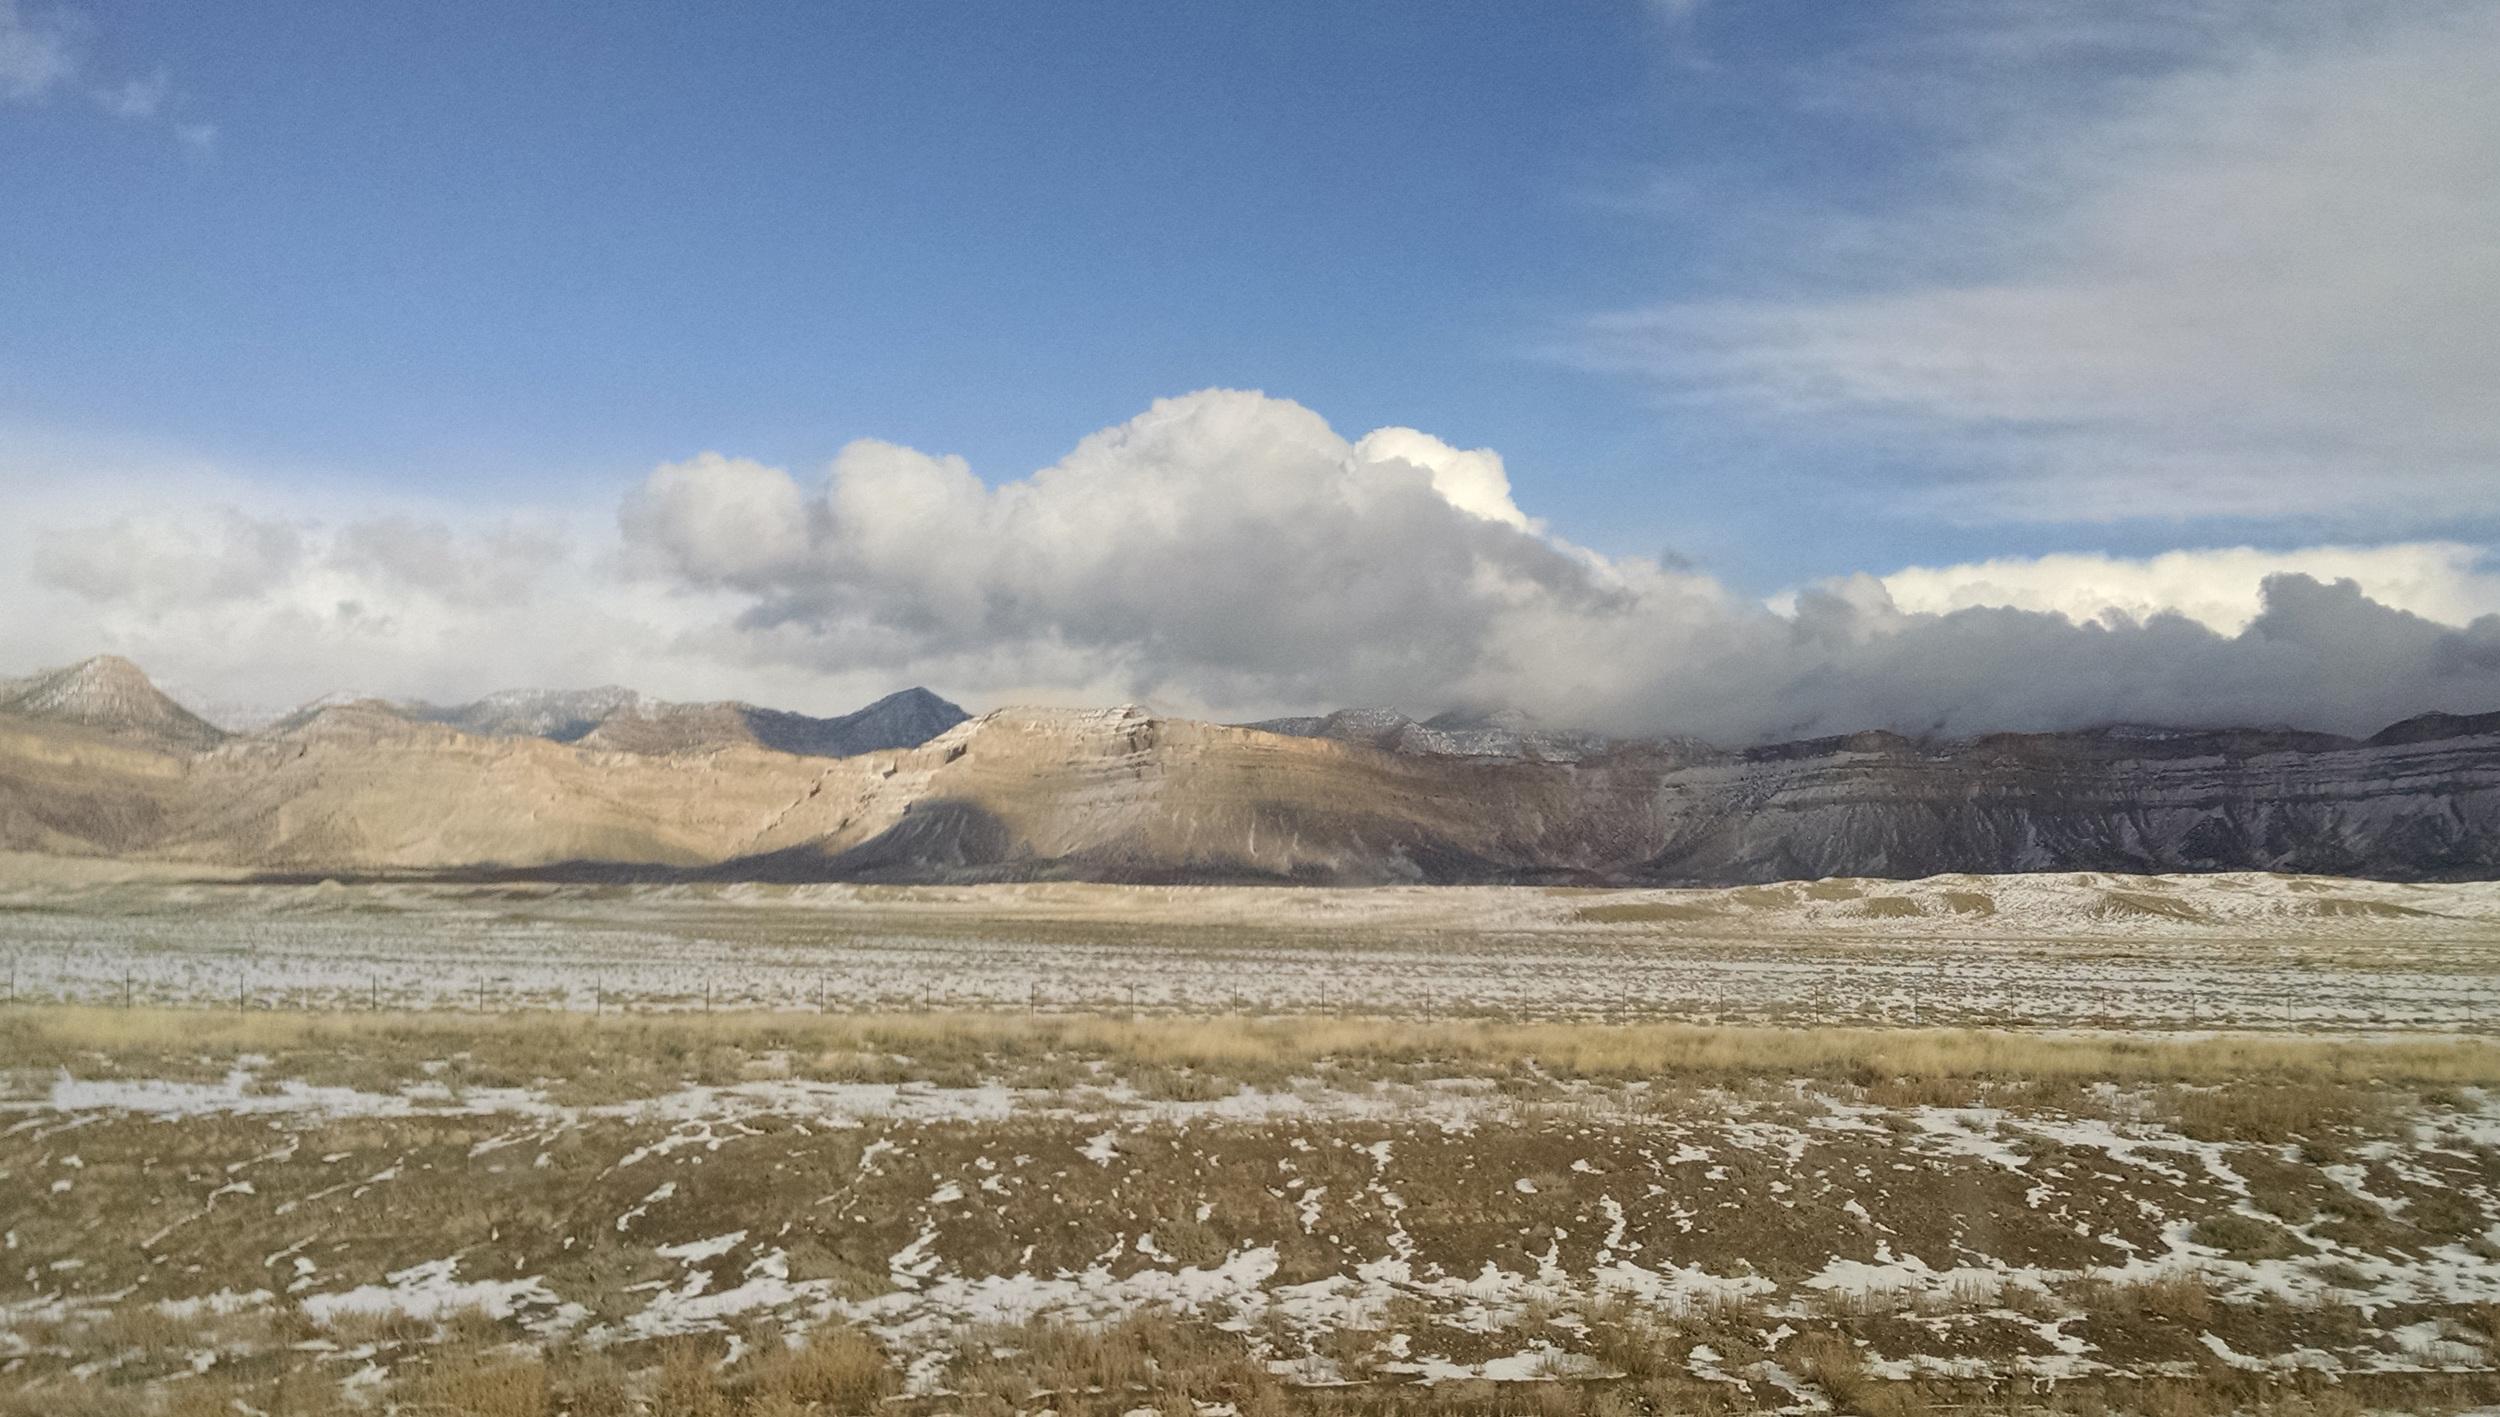 World famous MTN biking spot_Book cliffs_S. Utah.jpg